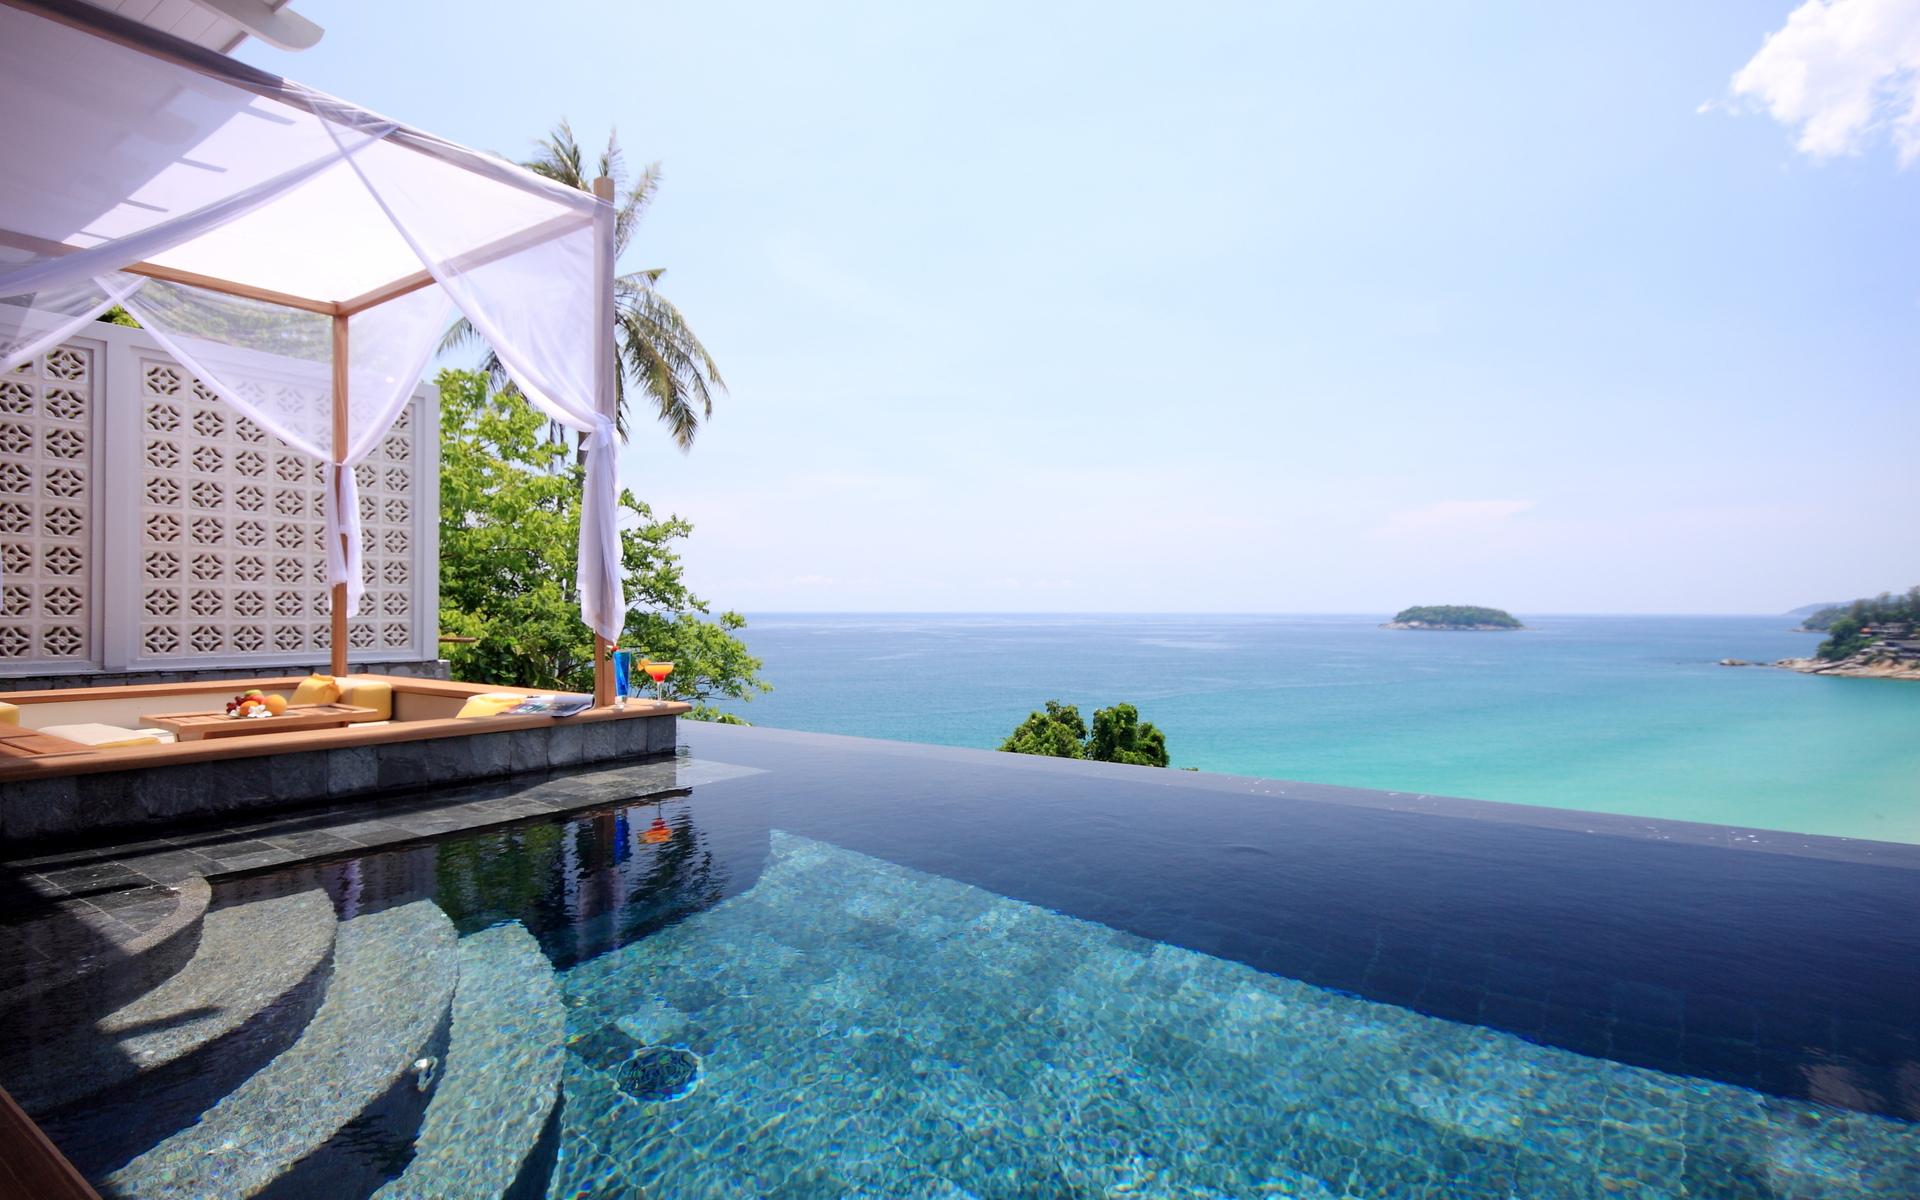 Tropical Vacation Relax Mood Bokeh Pool Reflection Ocean